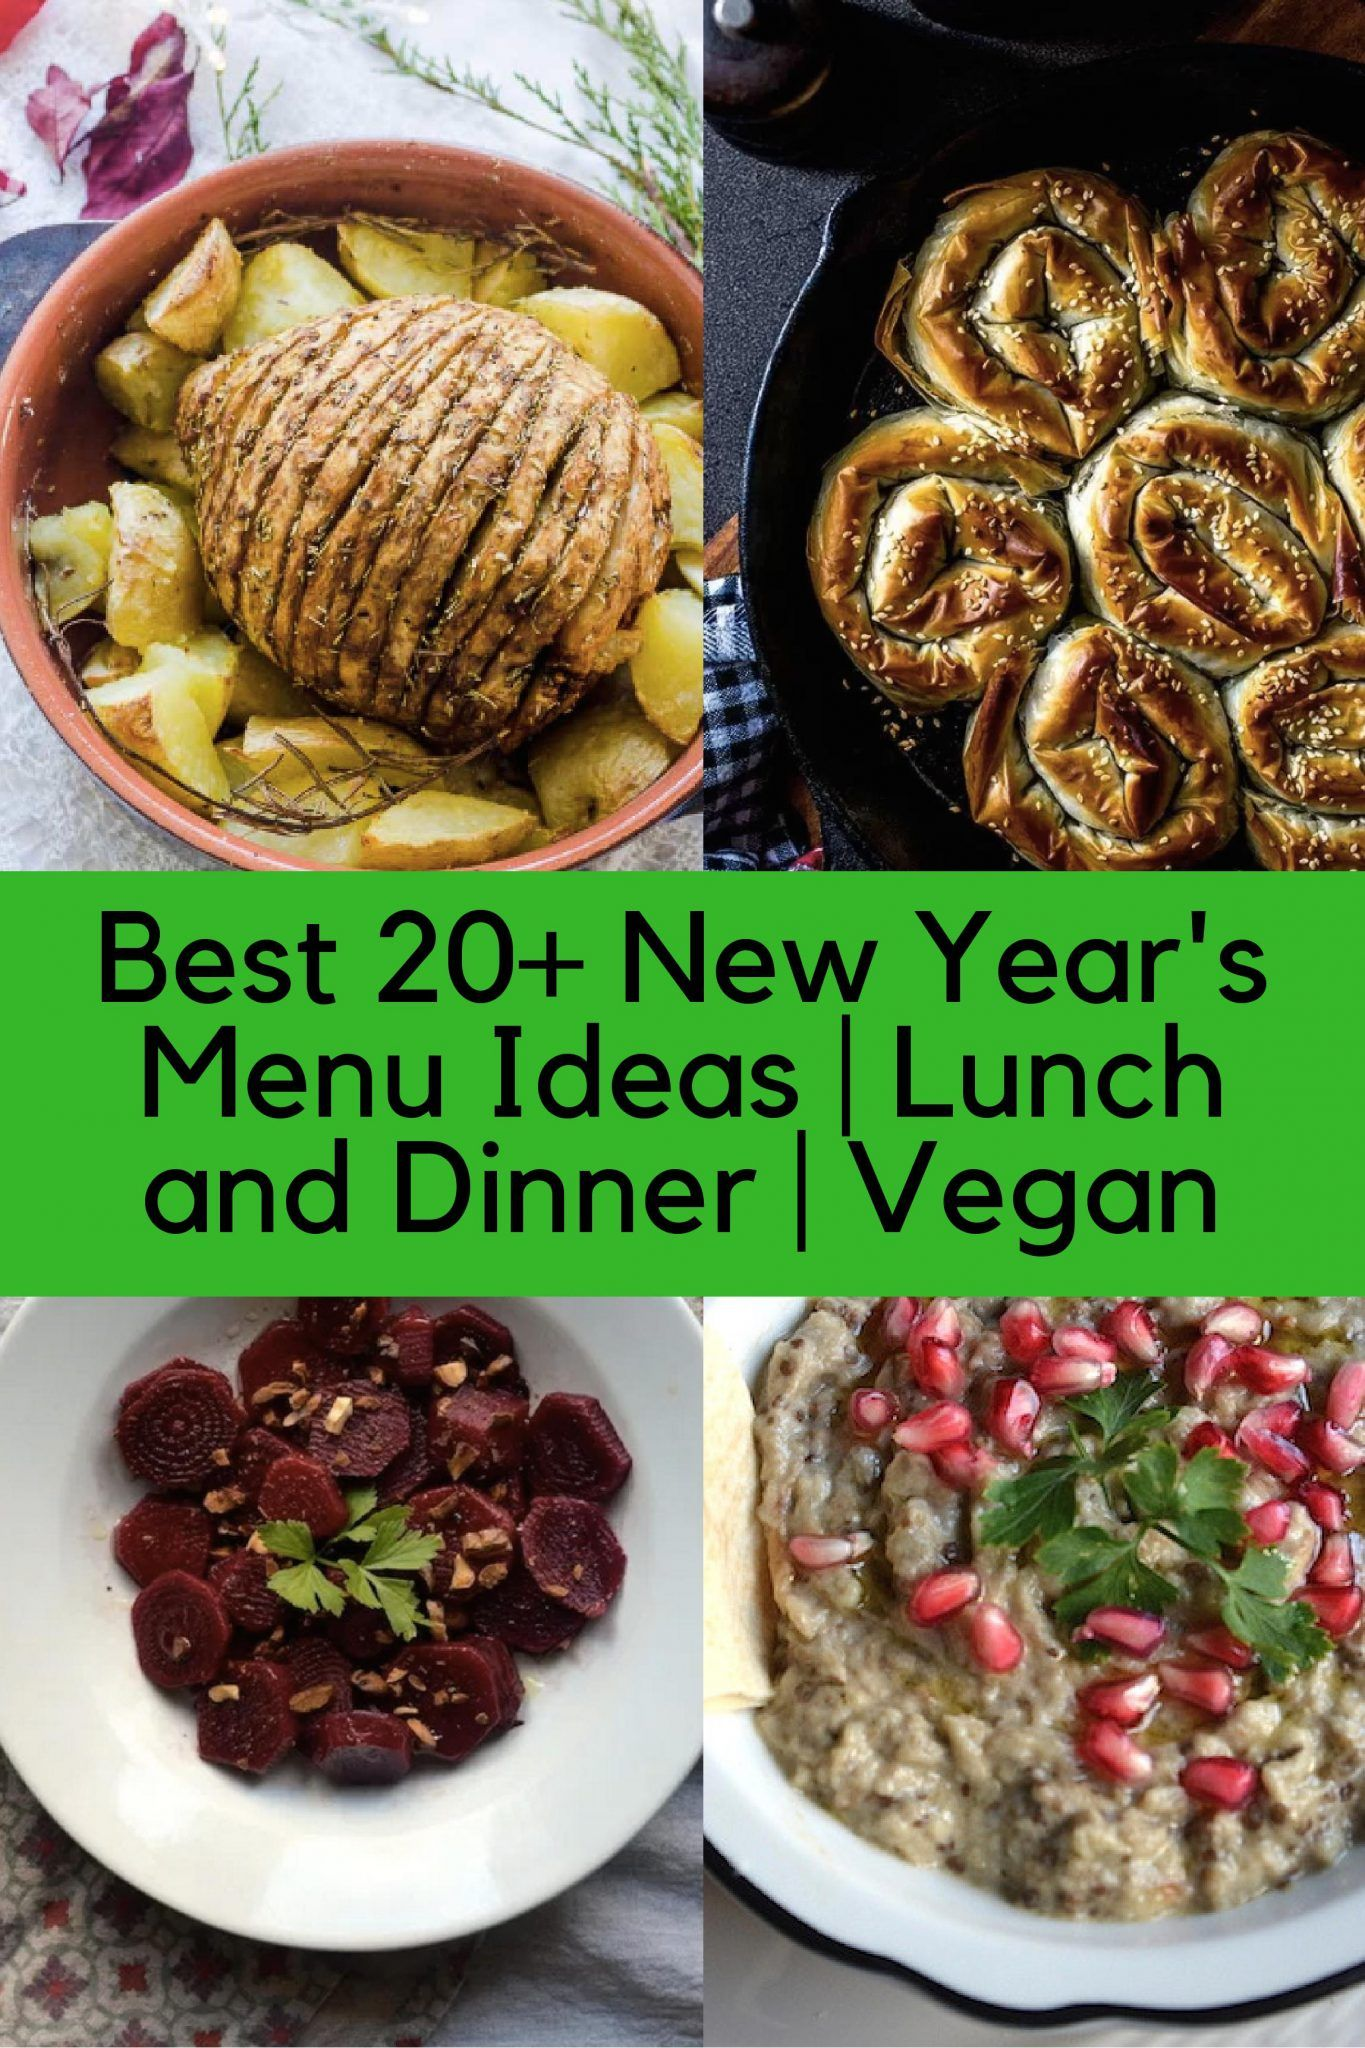 Best 20 New Year S Menu Ideas Lunch And Dinner Vegan New Year Menu Vegan Menu Salad Recipes For Dinner